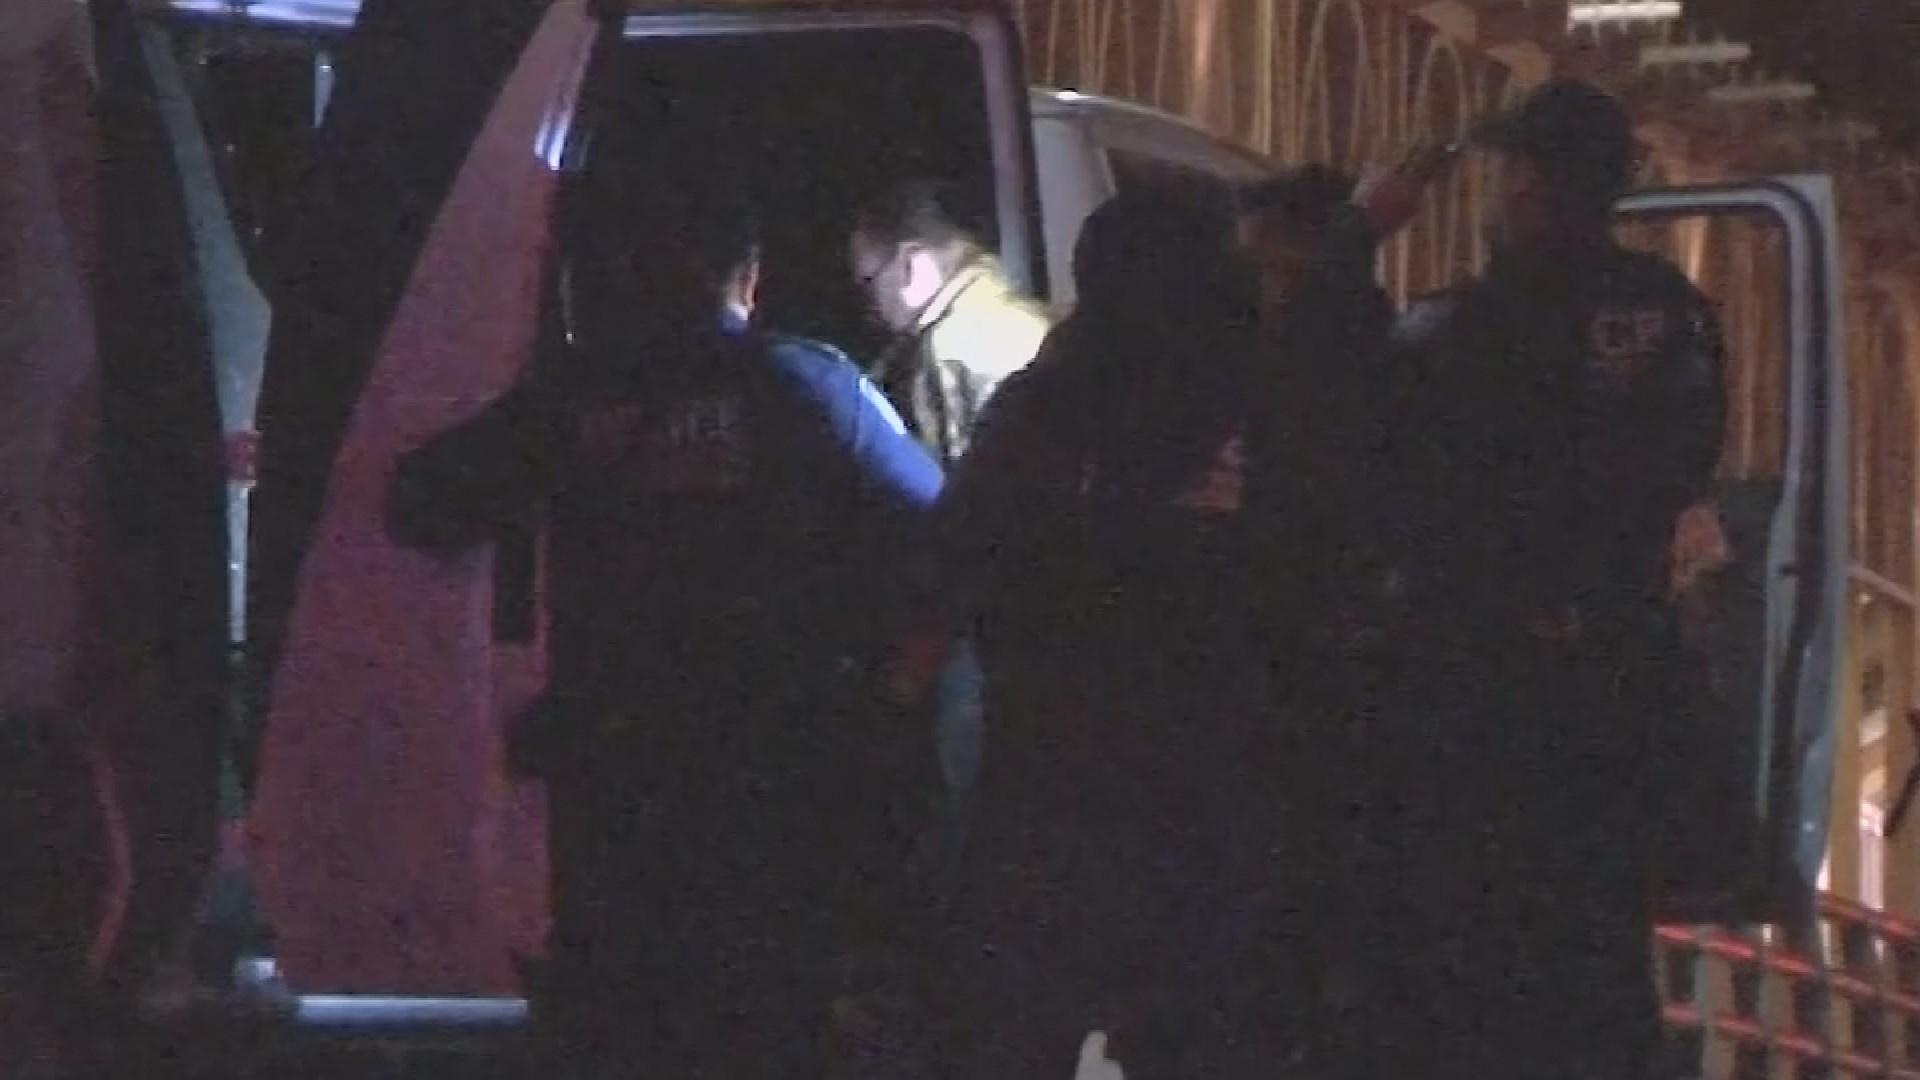 Orson William Black is taken into custody. (Source: 3TV/CBS 5 News)